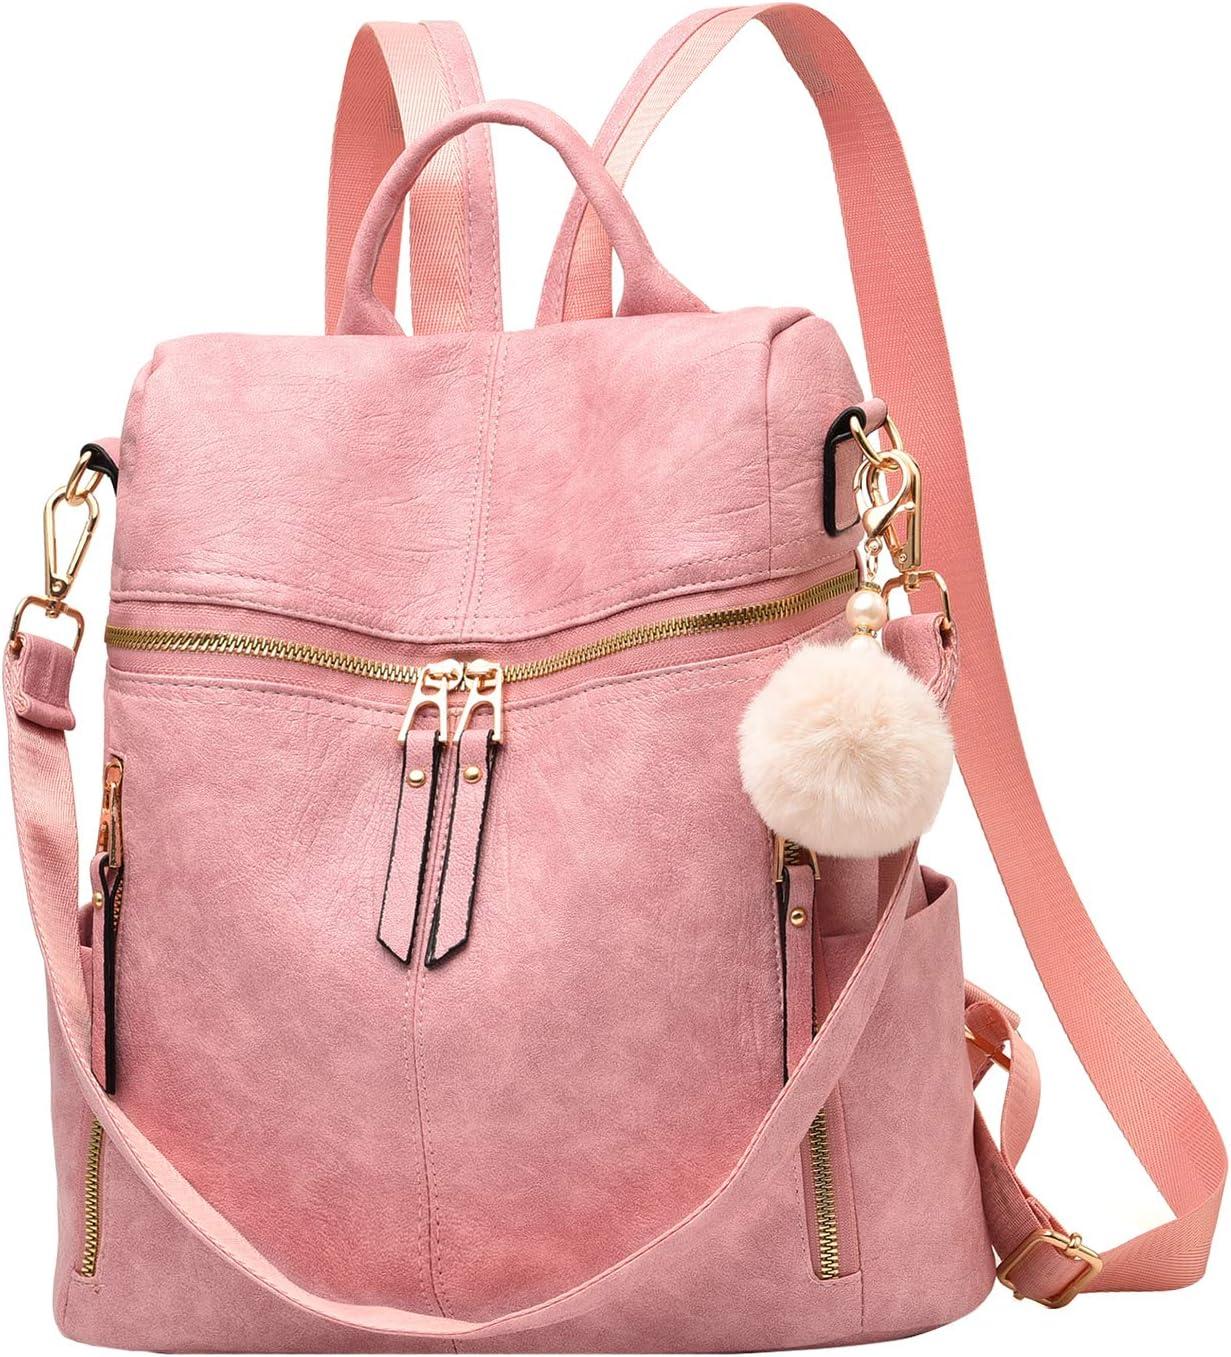 Backpack Purse for Women Multi-pocket Large Capacity Leather Shoulder Bag Lightweight Cute Backpack for Girls,Pink